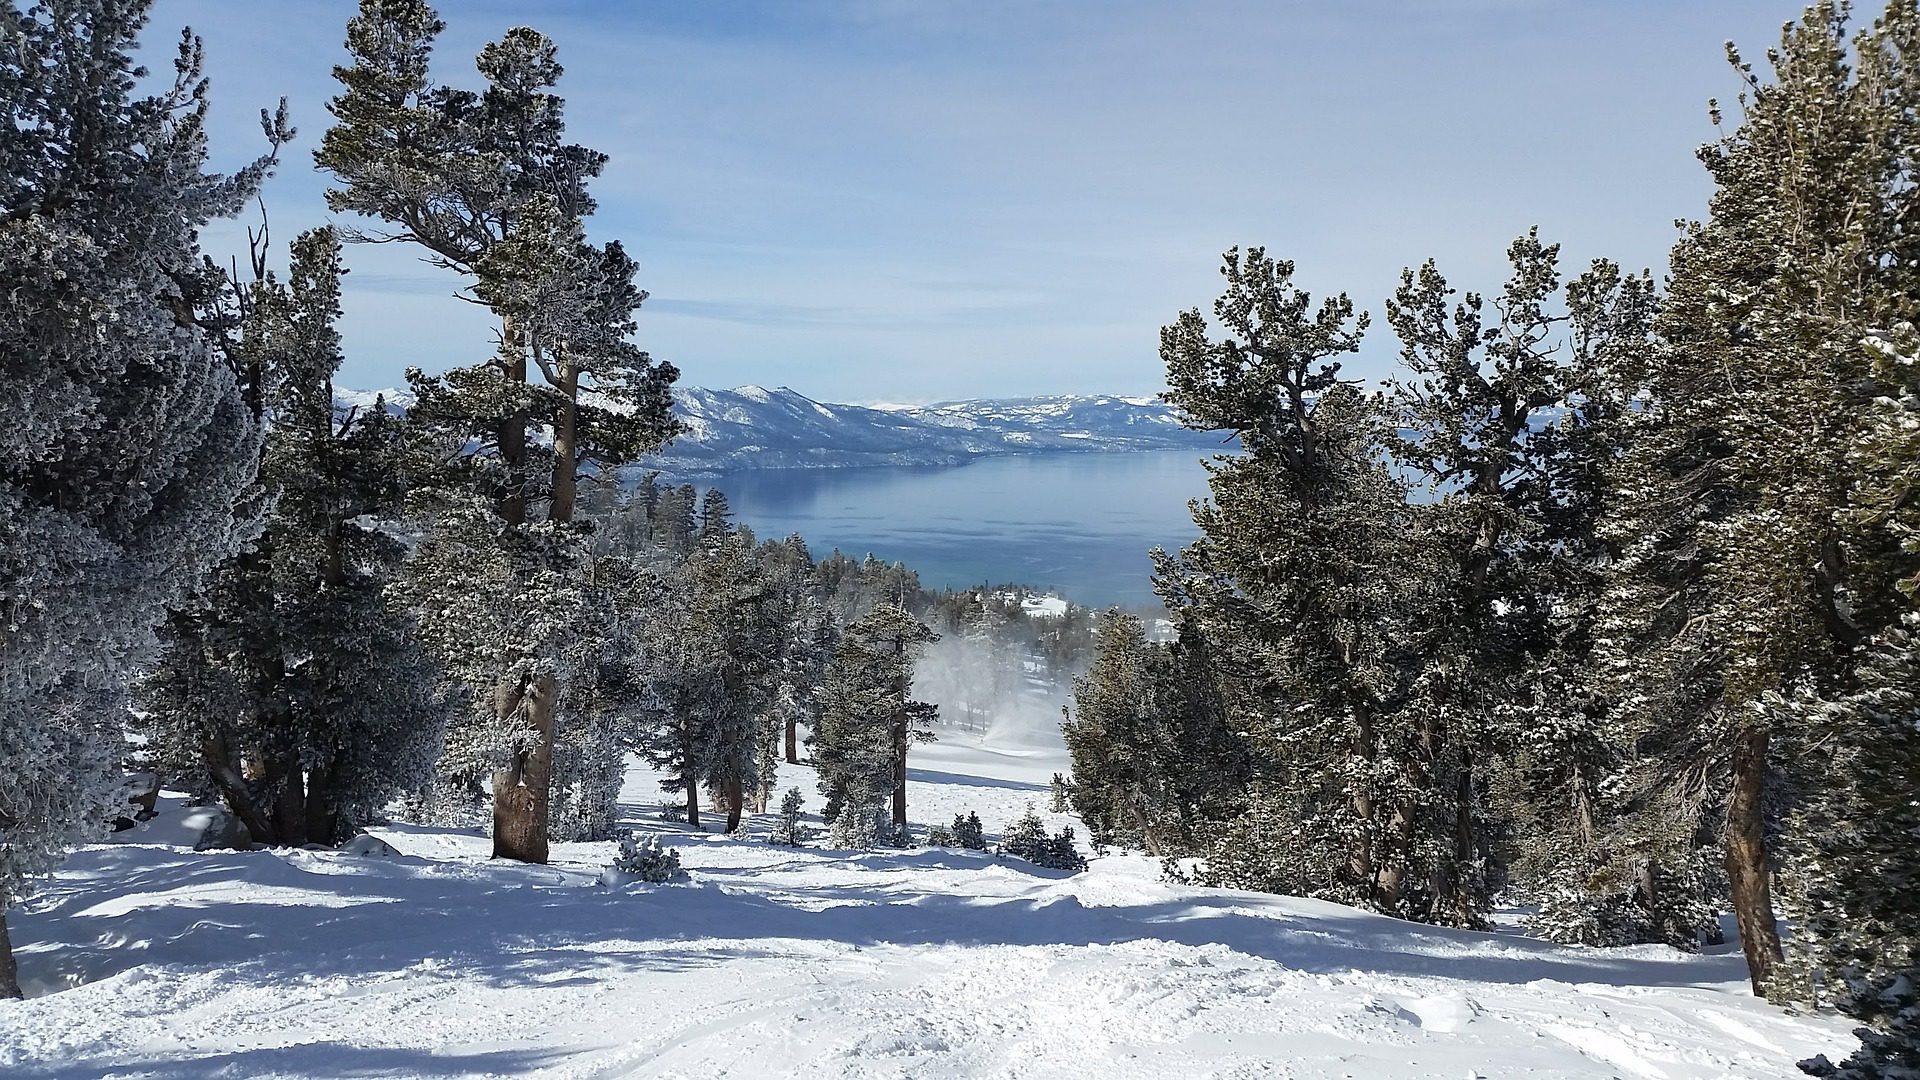 Lake Tahoe skiing, Lake Tahoe, CA